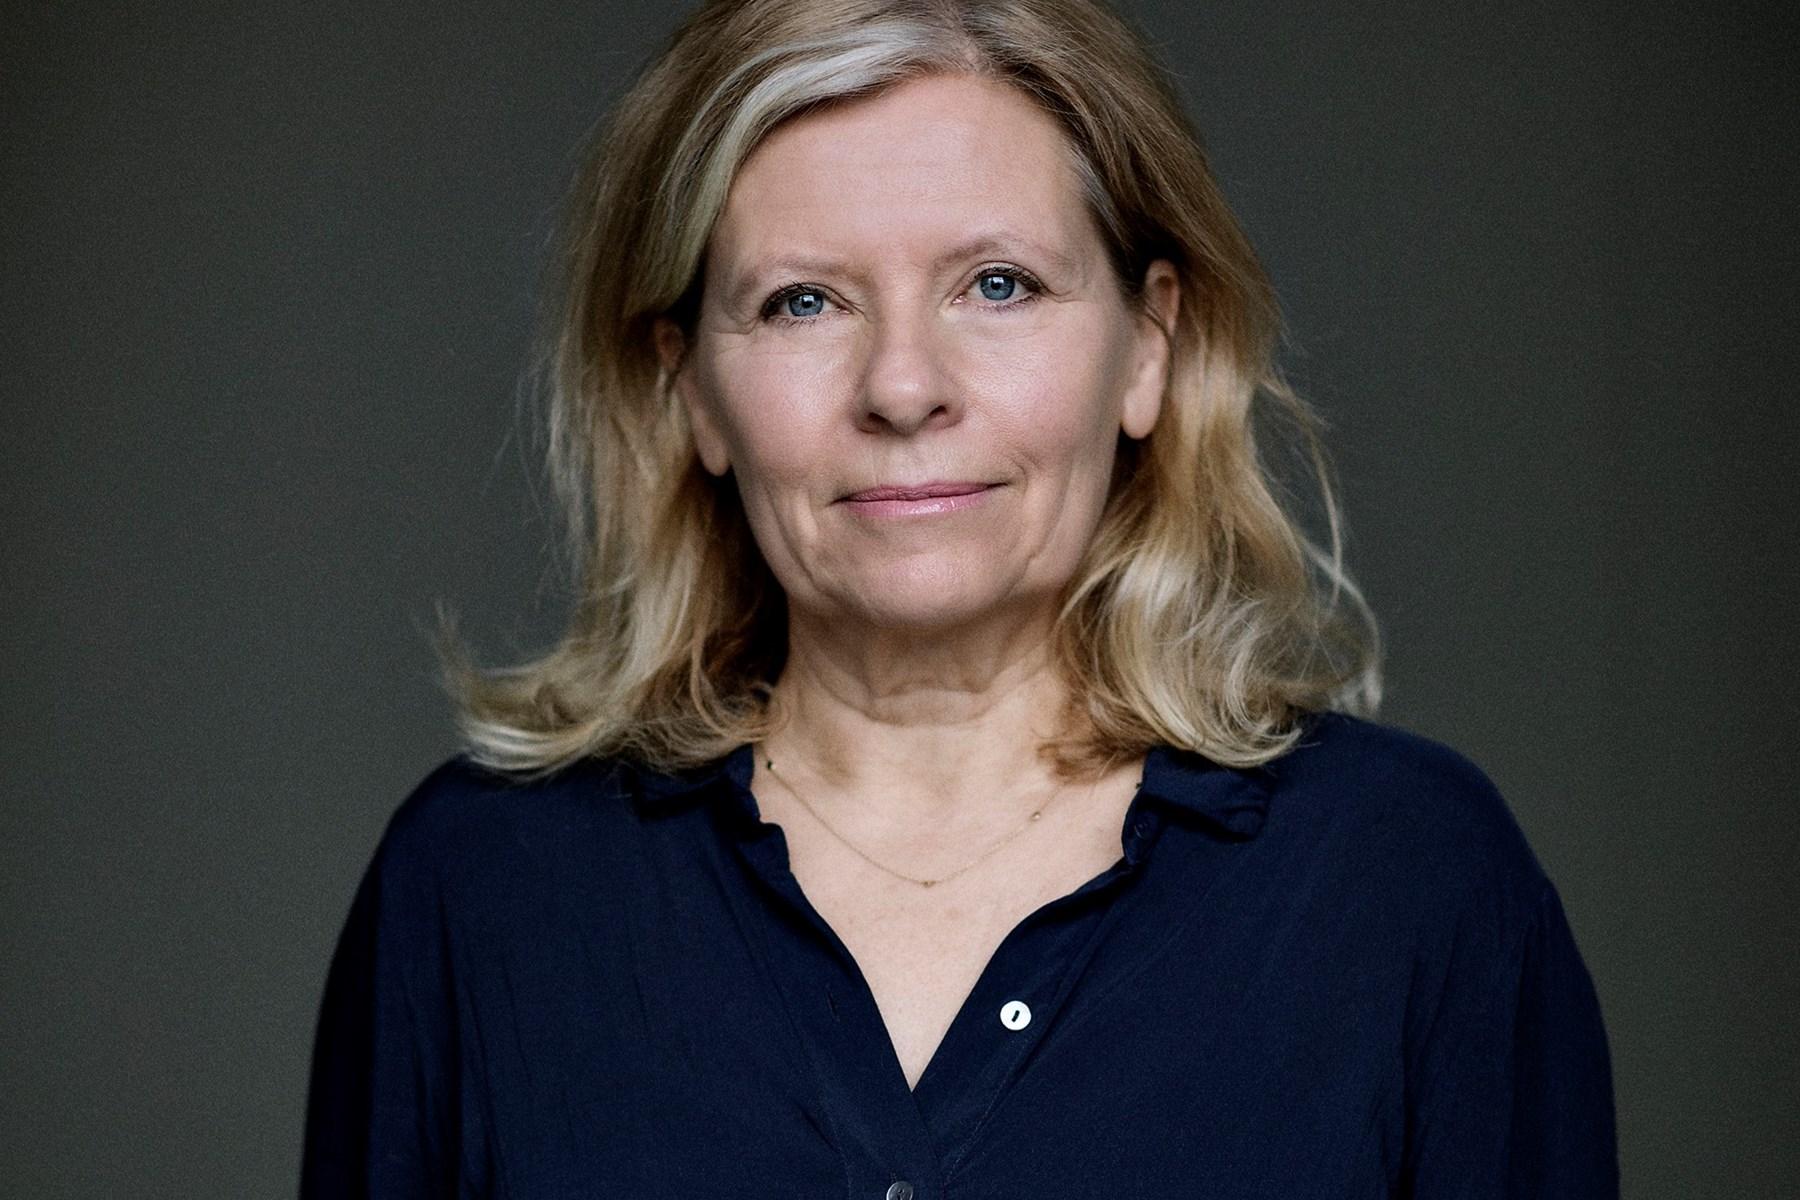 Berit Holbek Jensen/Dagbladenes Bureau